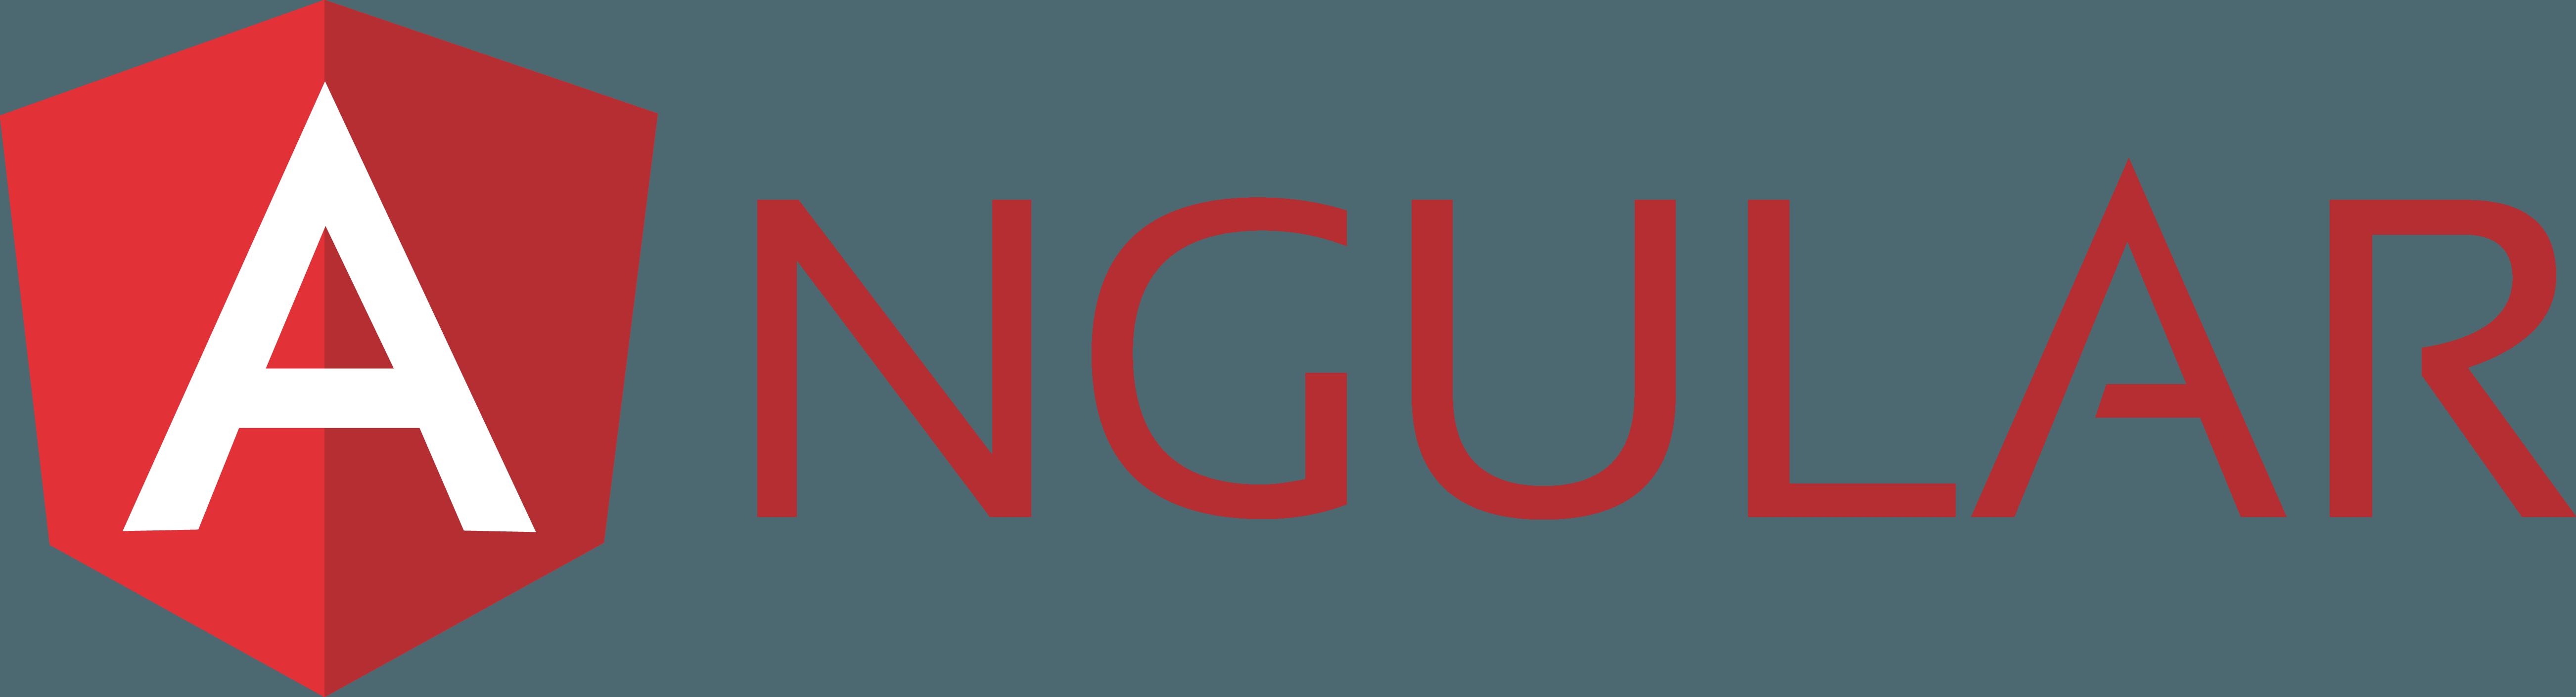 Angular Logo png